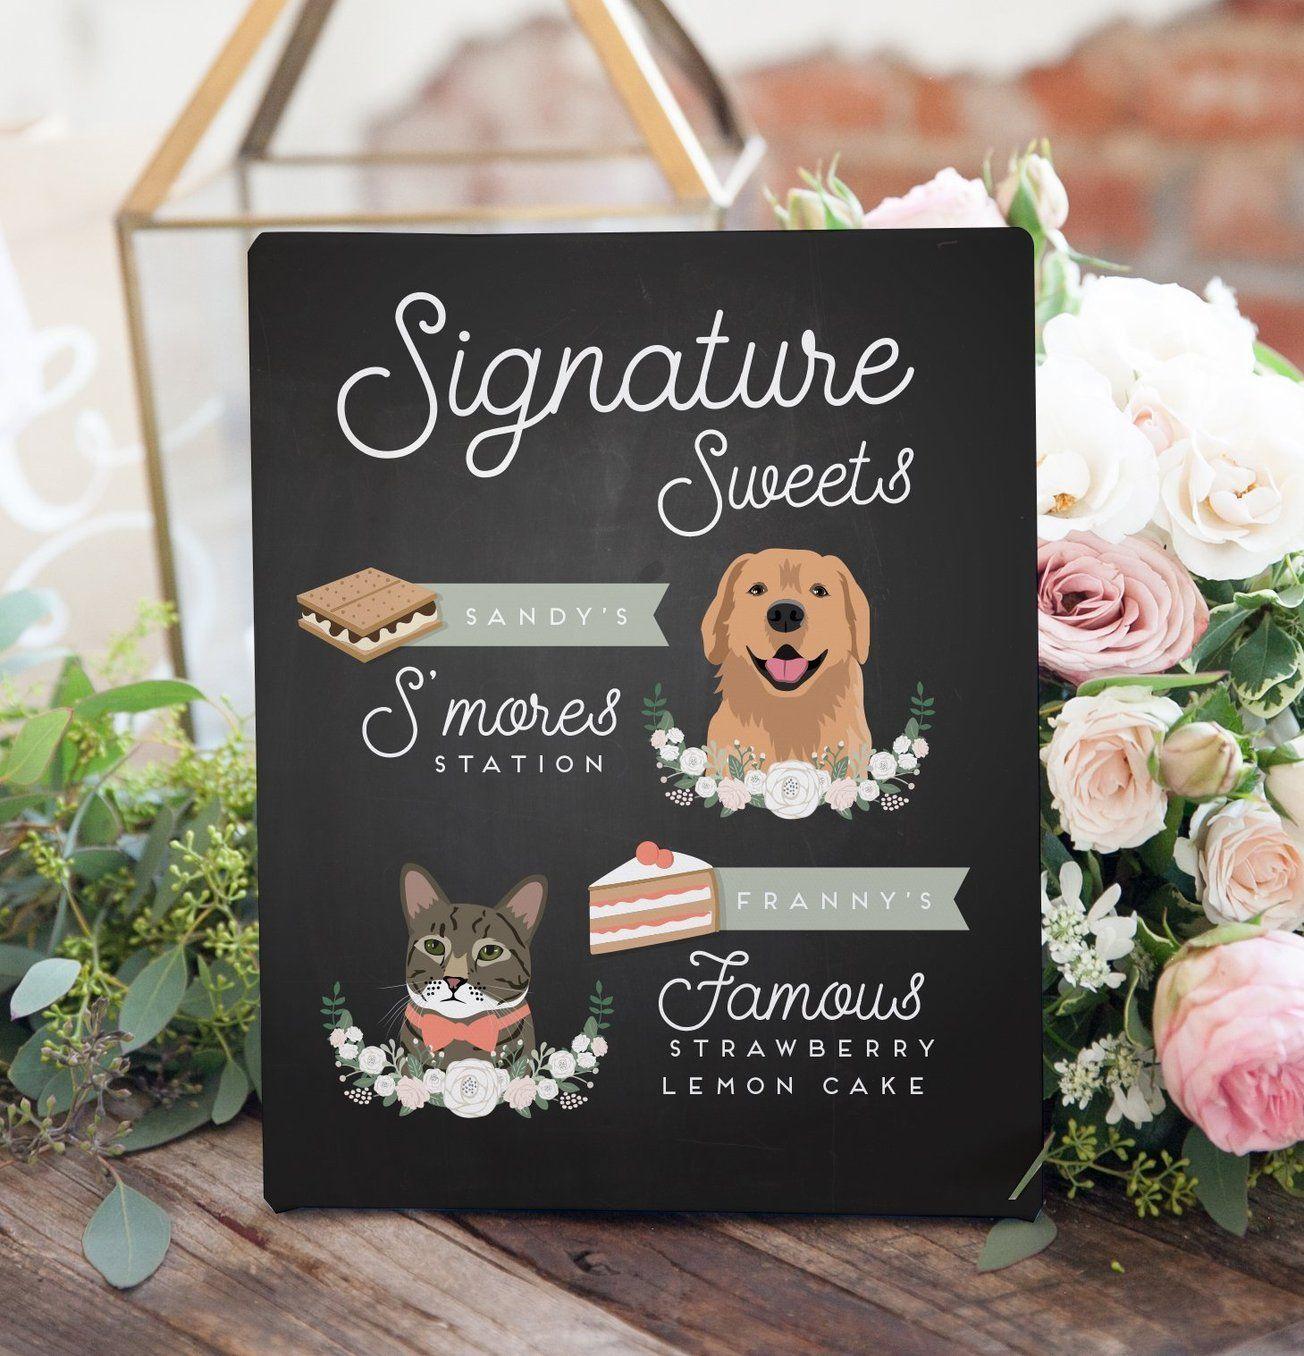 Wedding Dessert Table Sign: Chalkboard Dessert Sign For Wedding With Pet Portrait